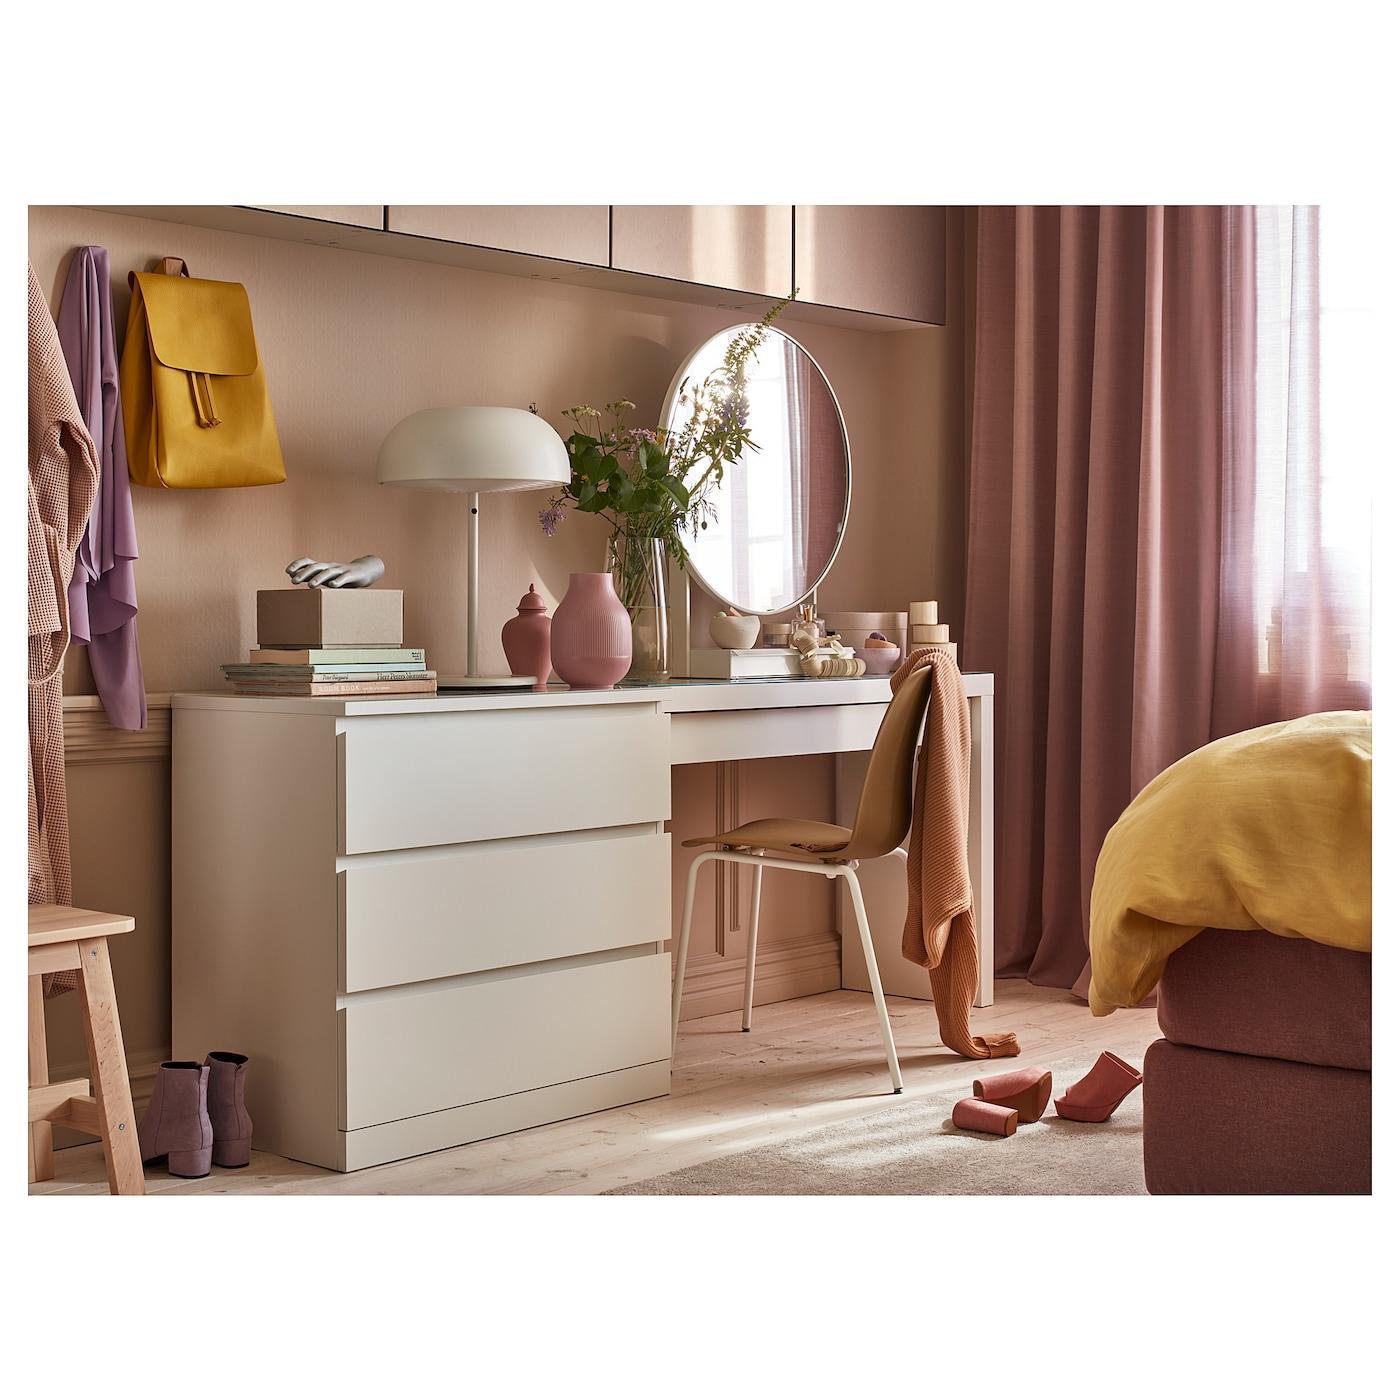 MALM Dressing table - white 6x6 cm